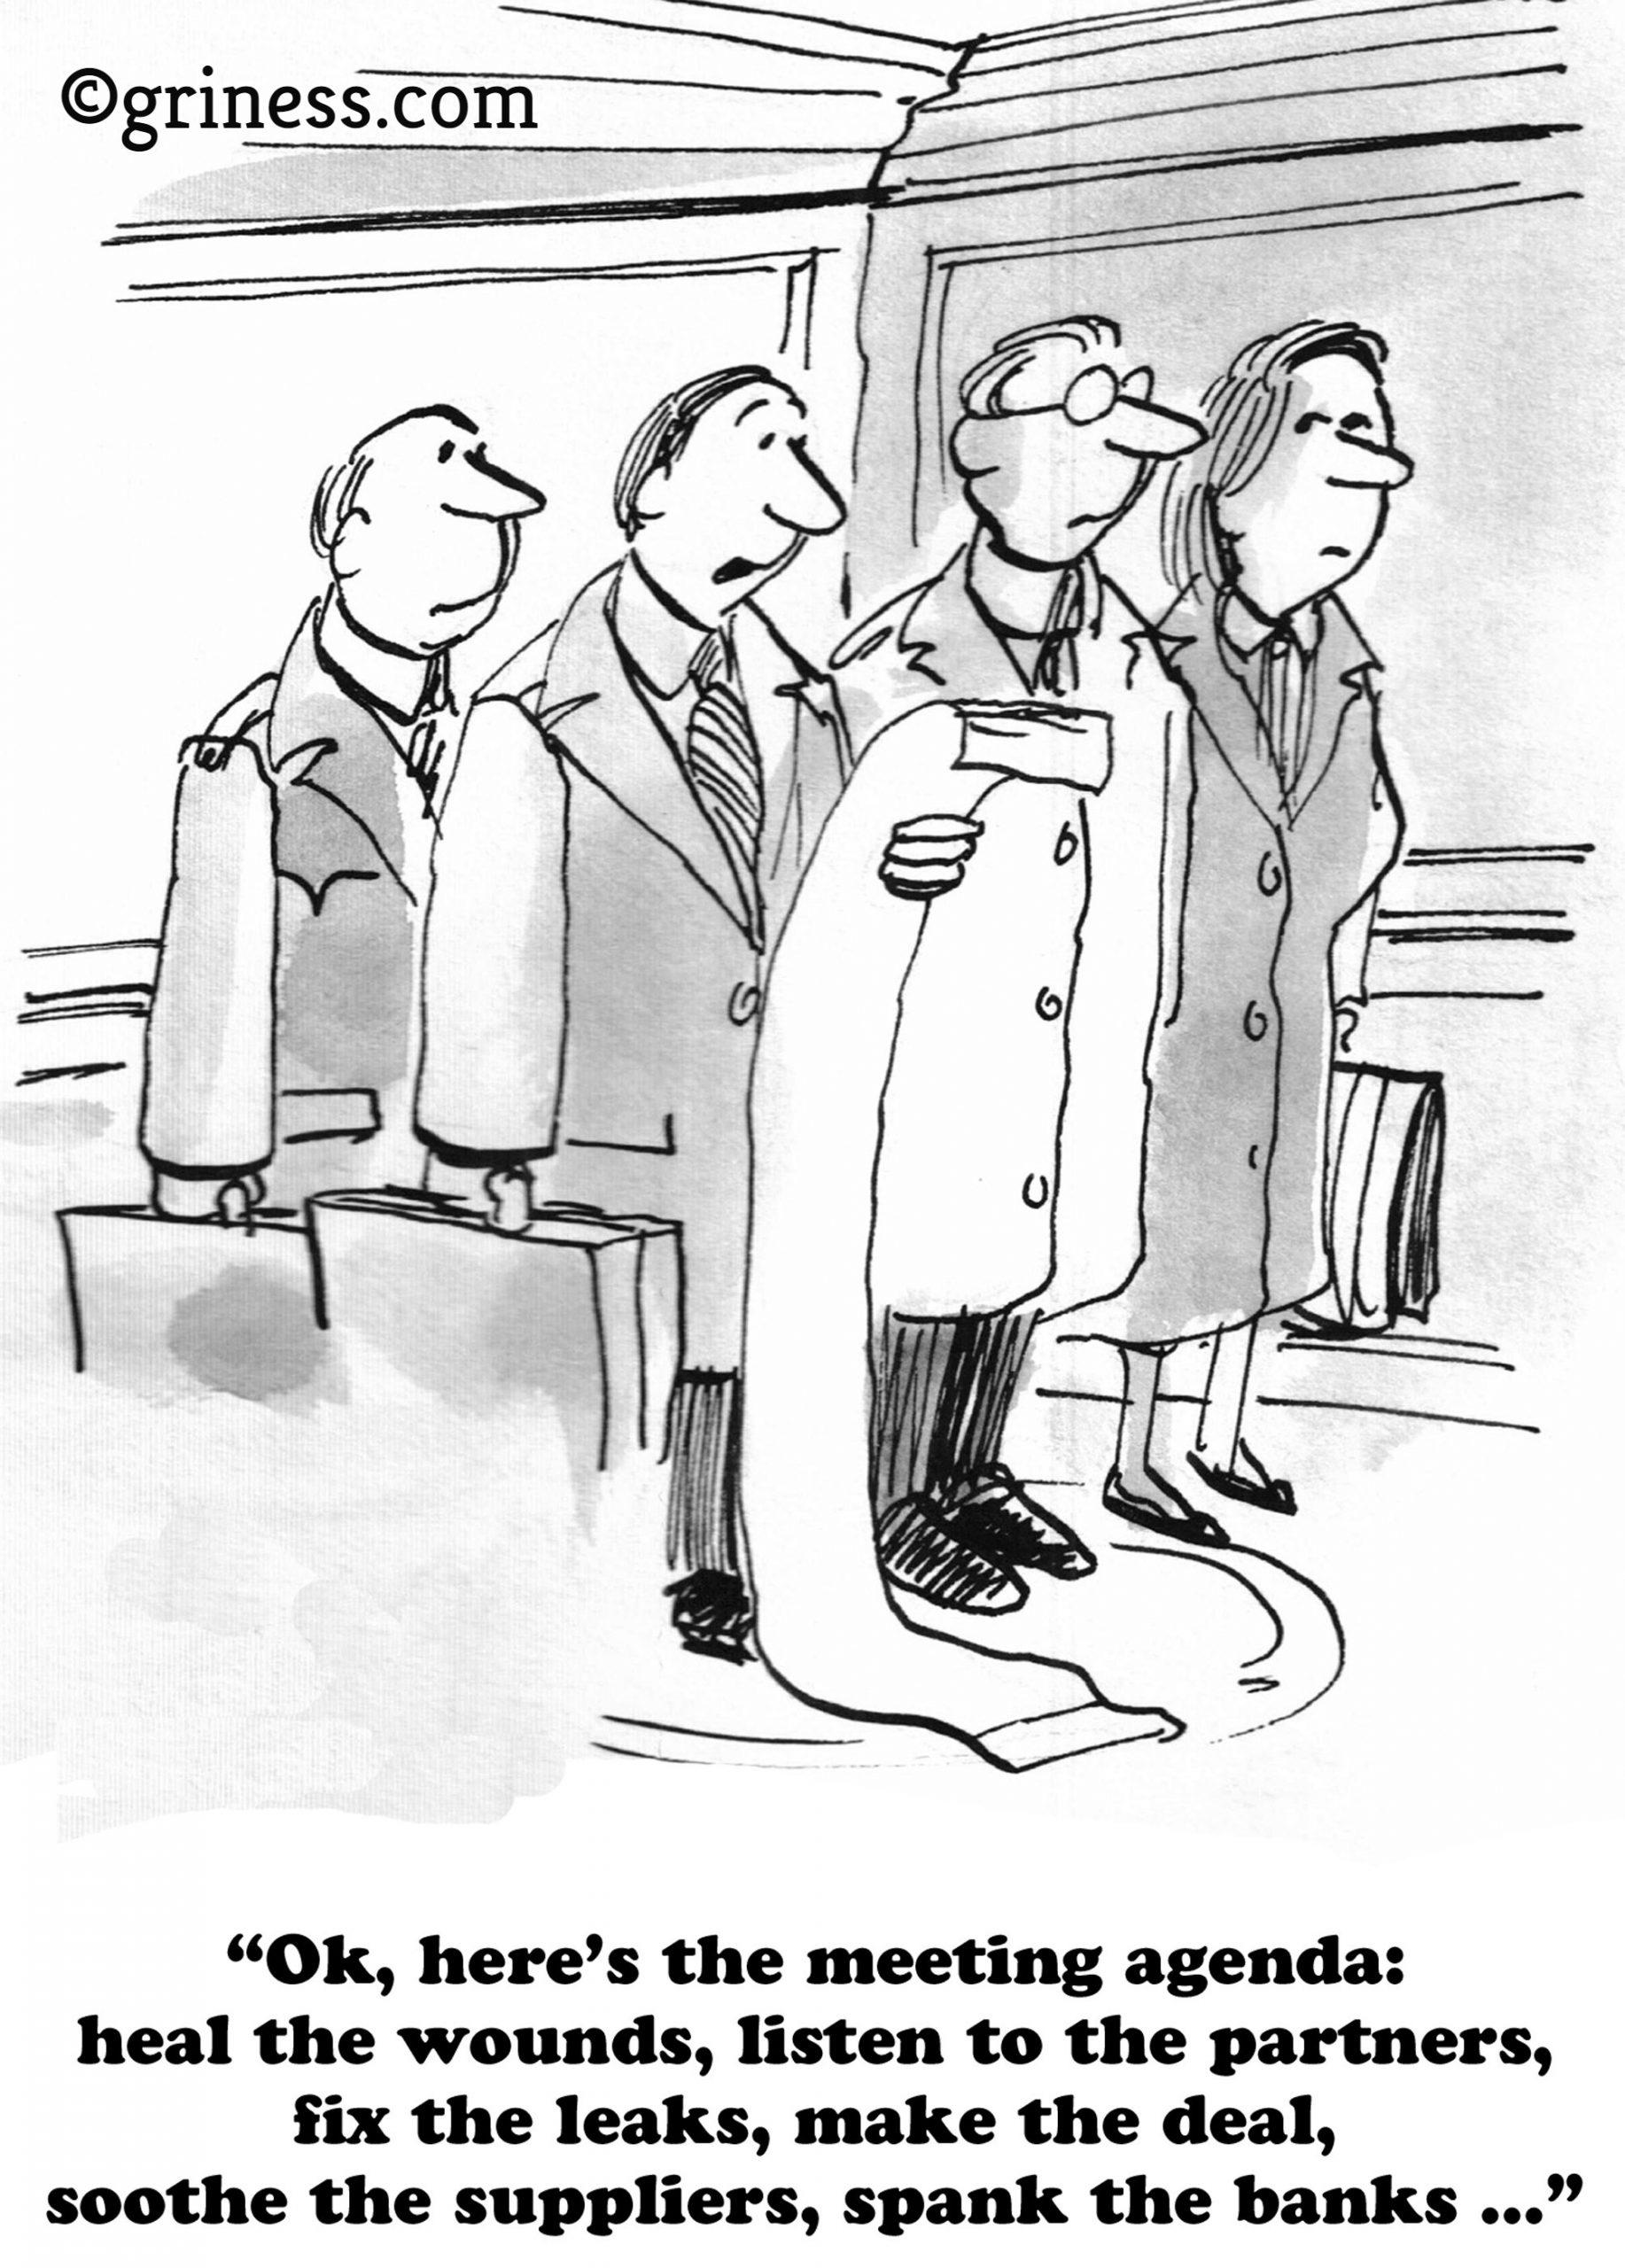 2 ok here is the meeting agenda jokes meeting comics